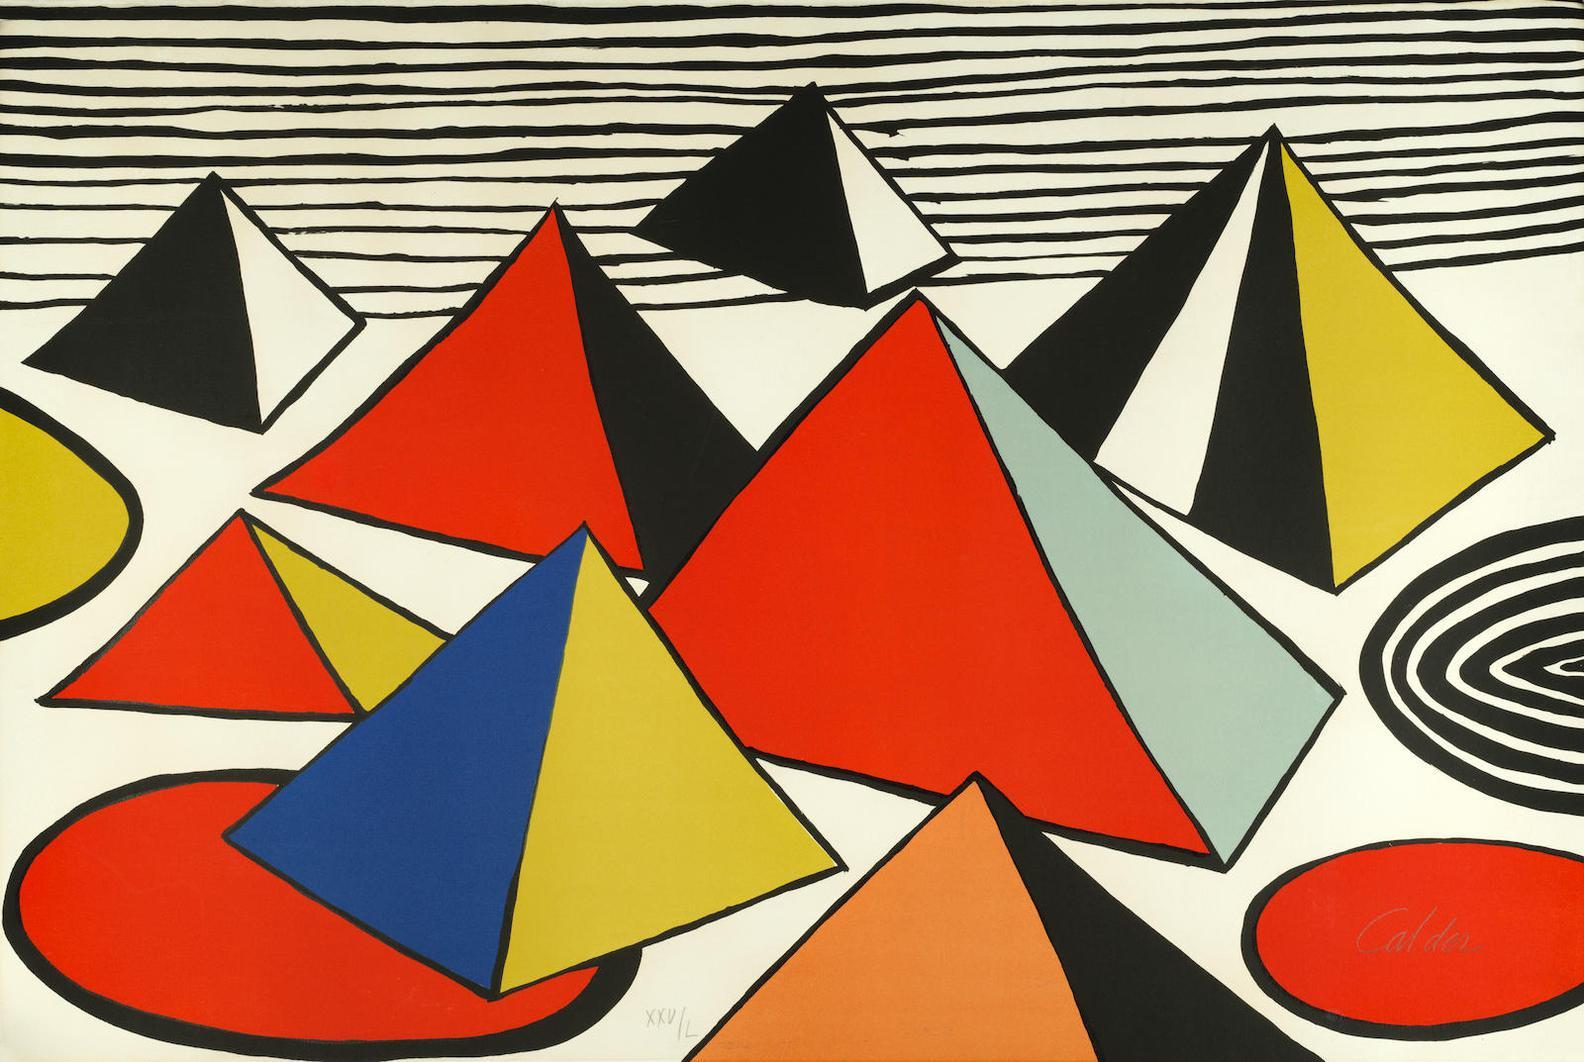 Alexander Calder-Pyramids II-1975